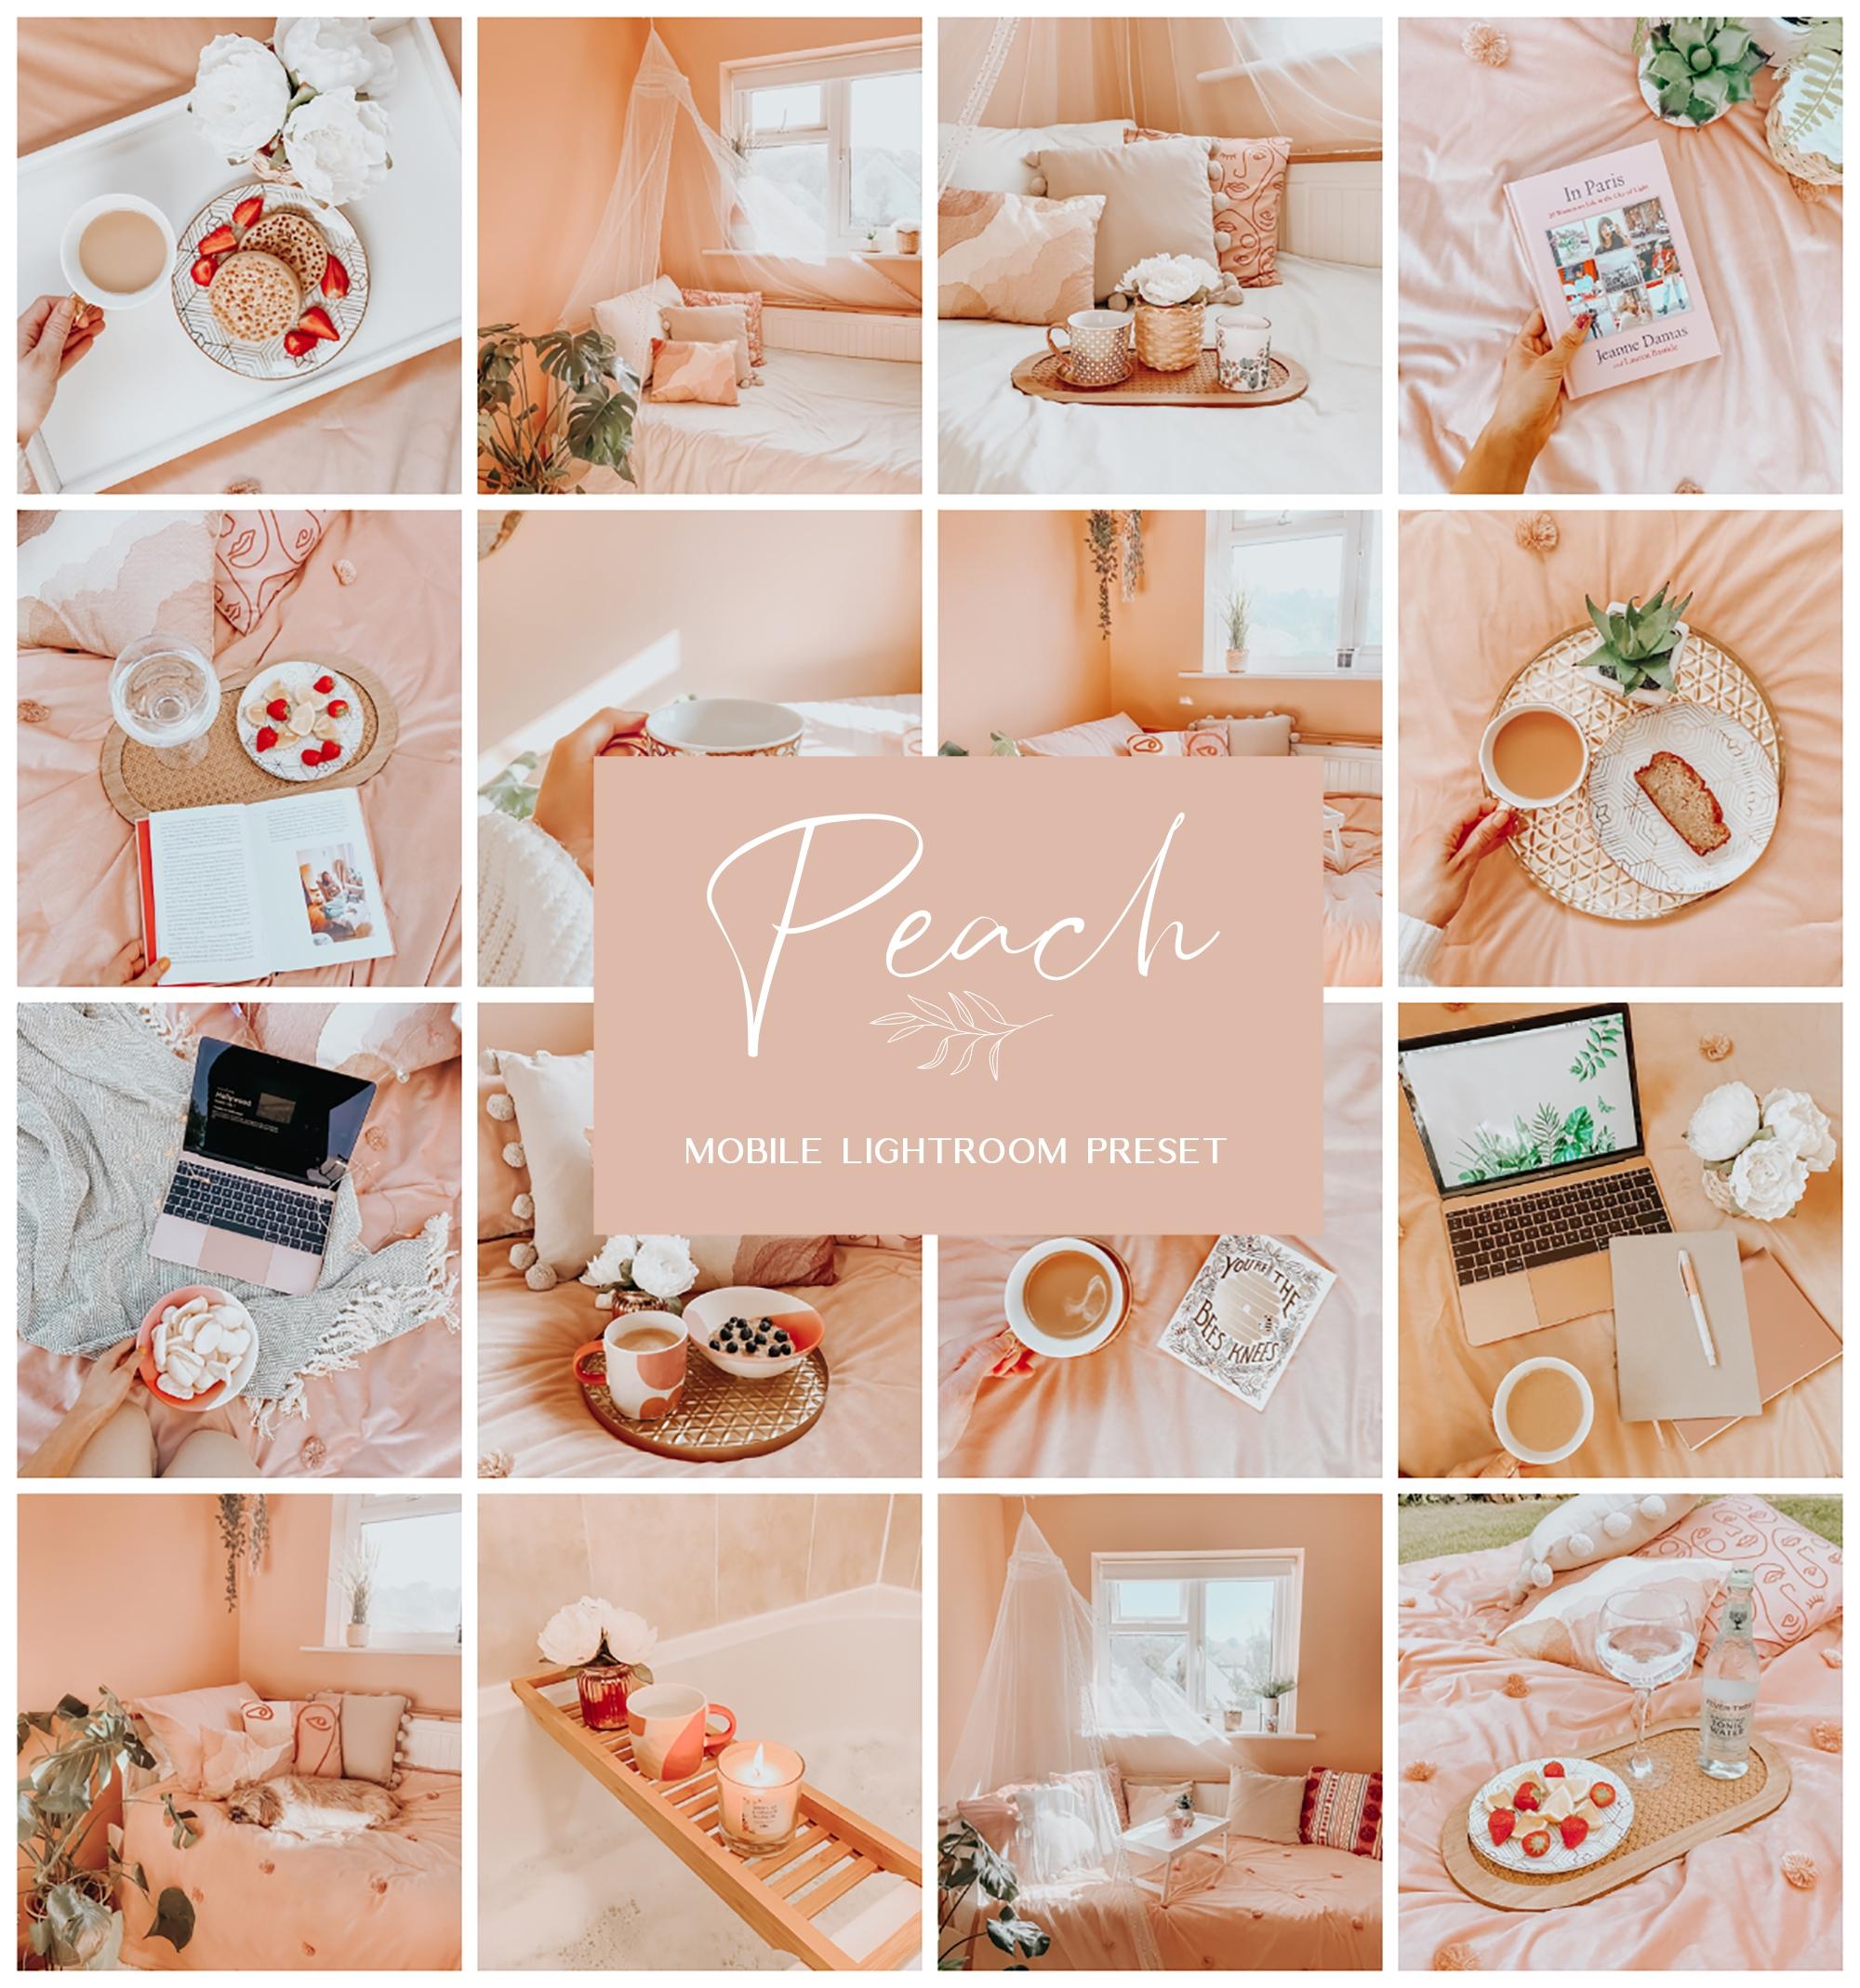 peach-lightroom-preset